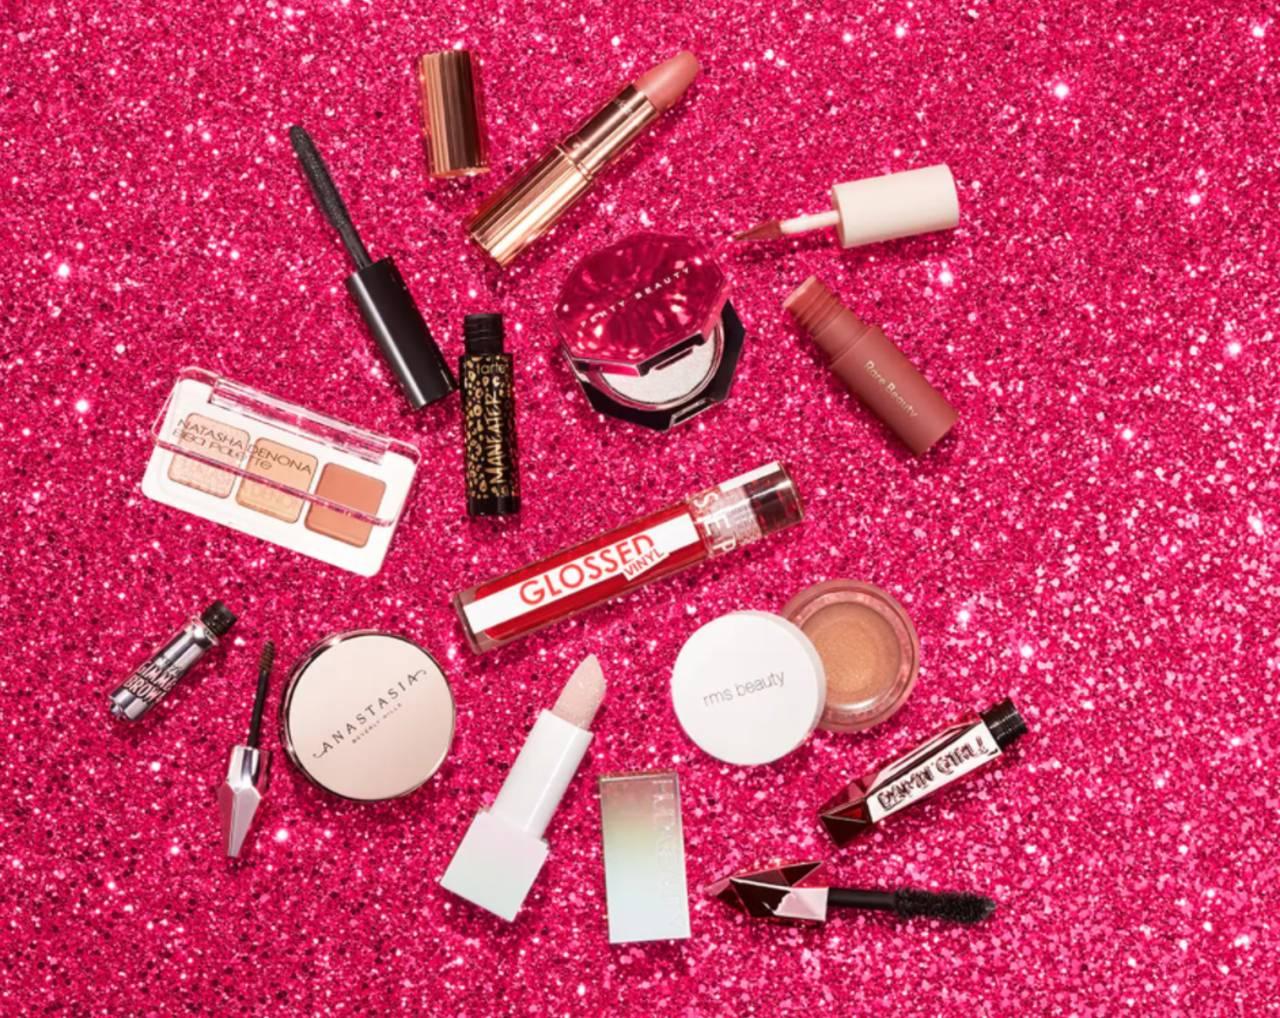 calendario Sephora Favoritos 2021 productos maquillaje